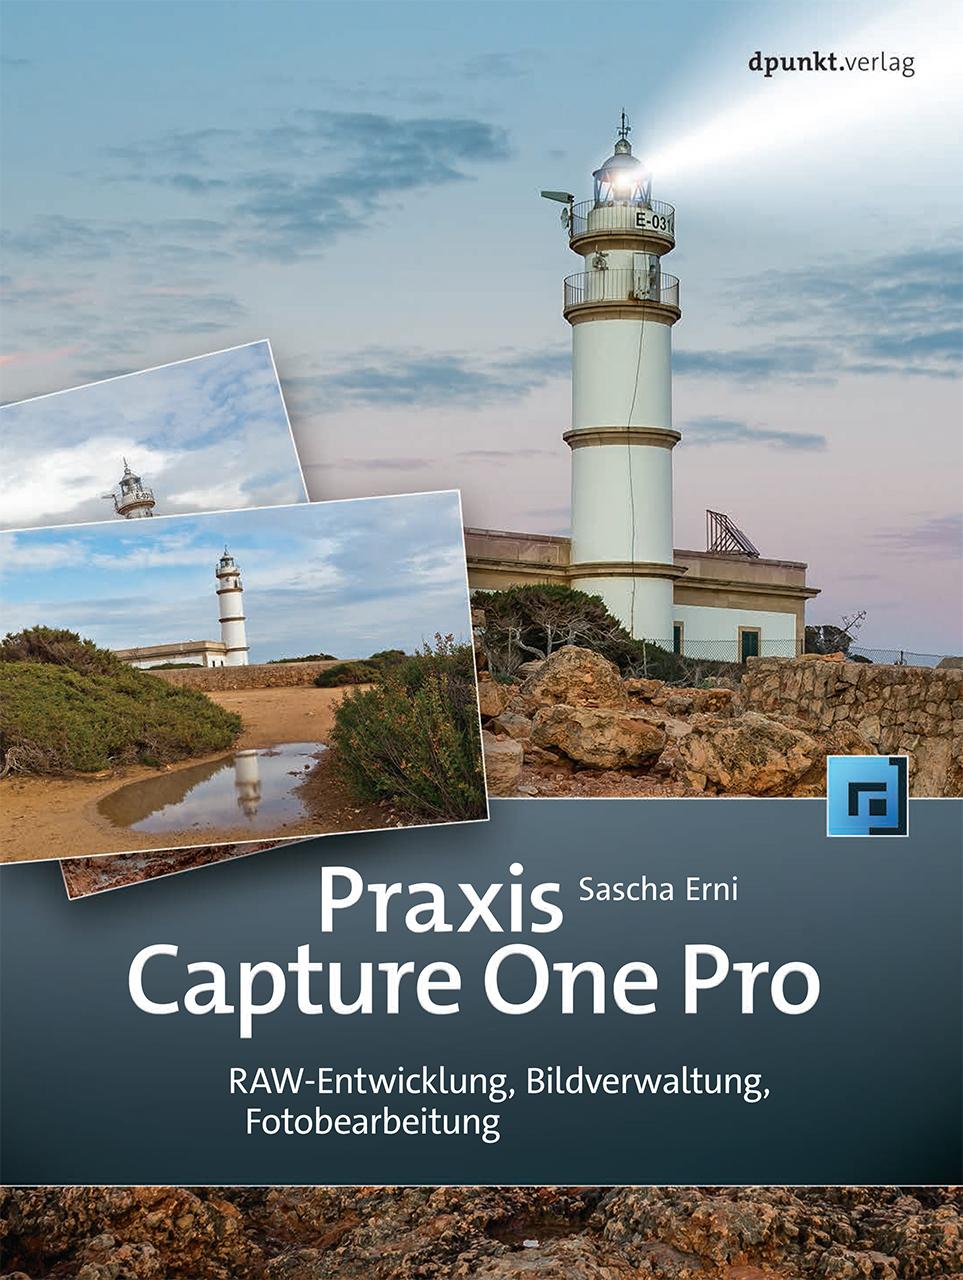 Praxis Capture One Pro Sascha Erni